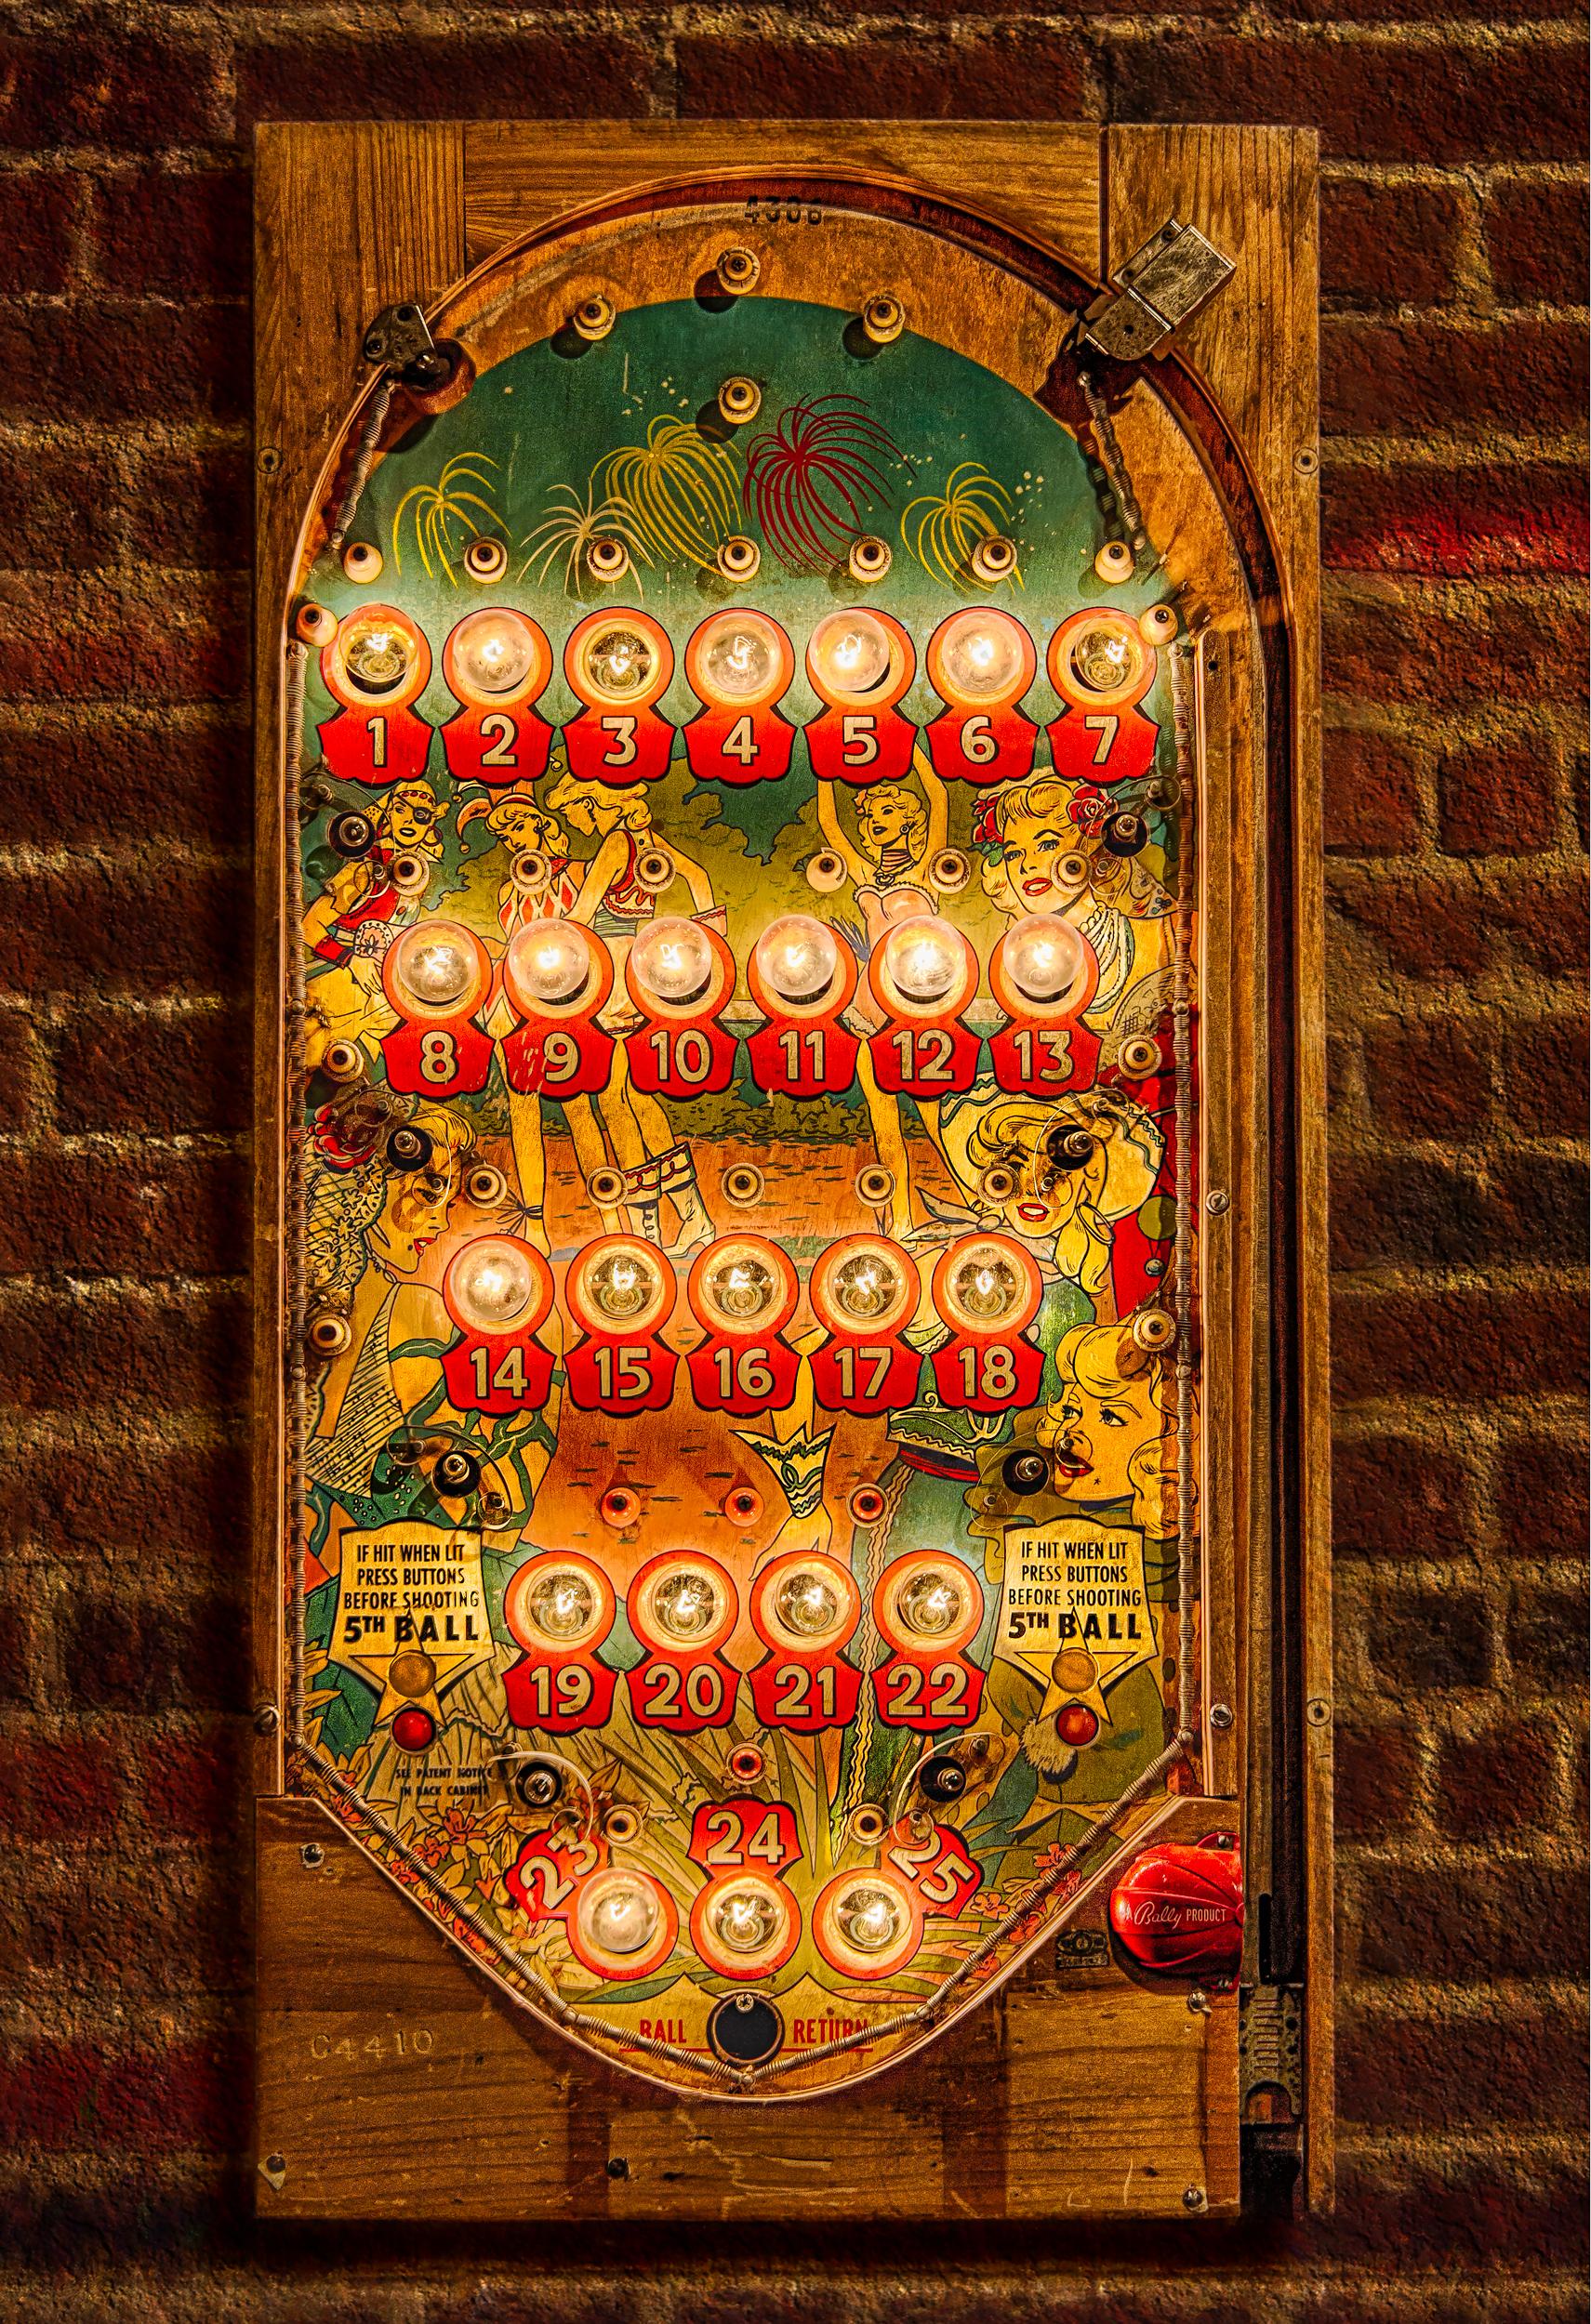 Pinball-working-master-for-ImagePrint.jpg